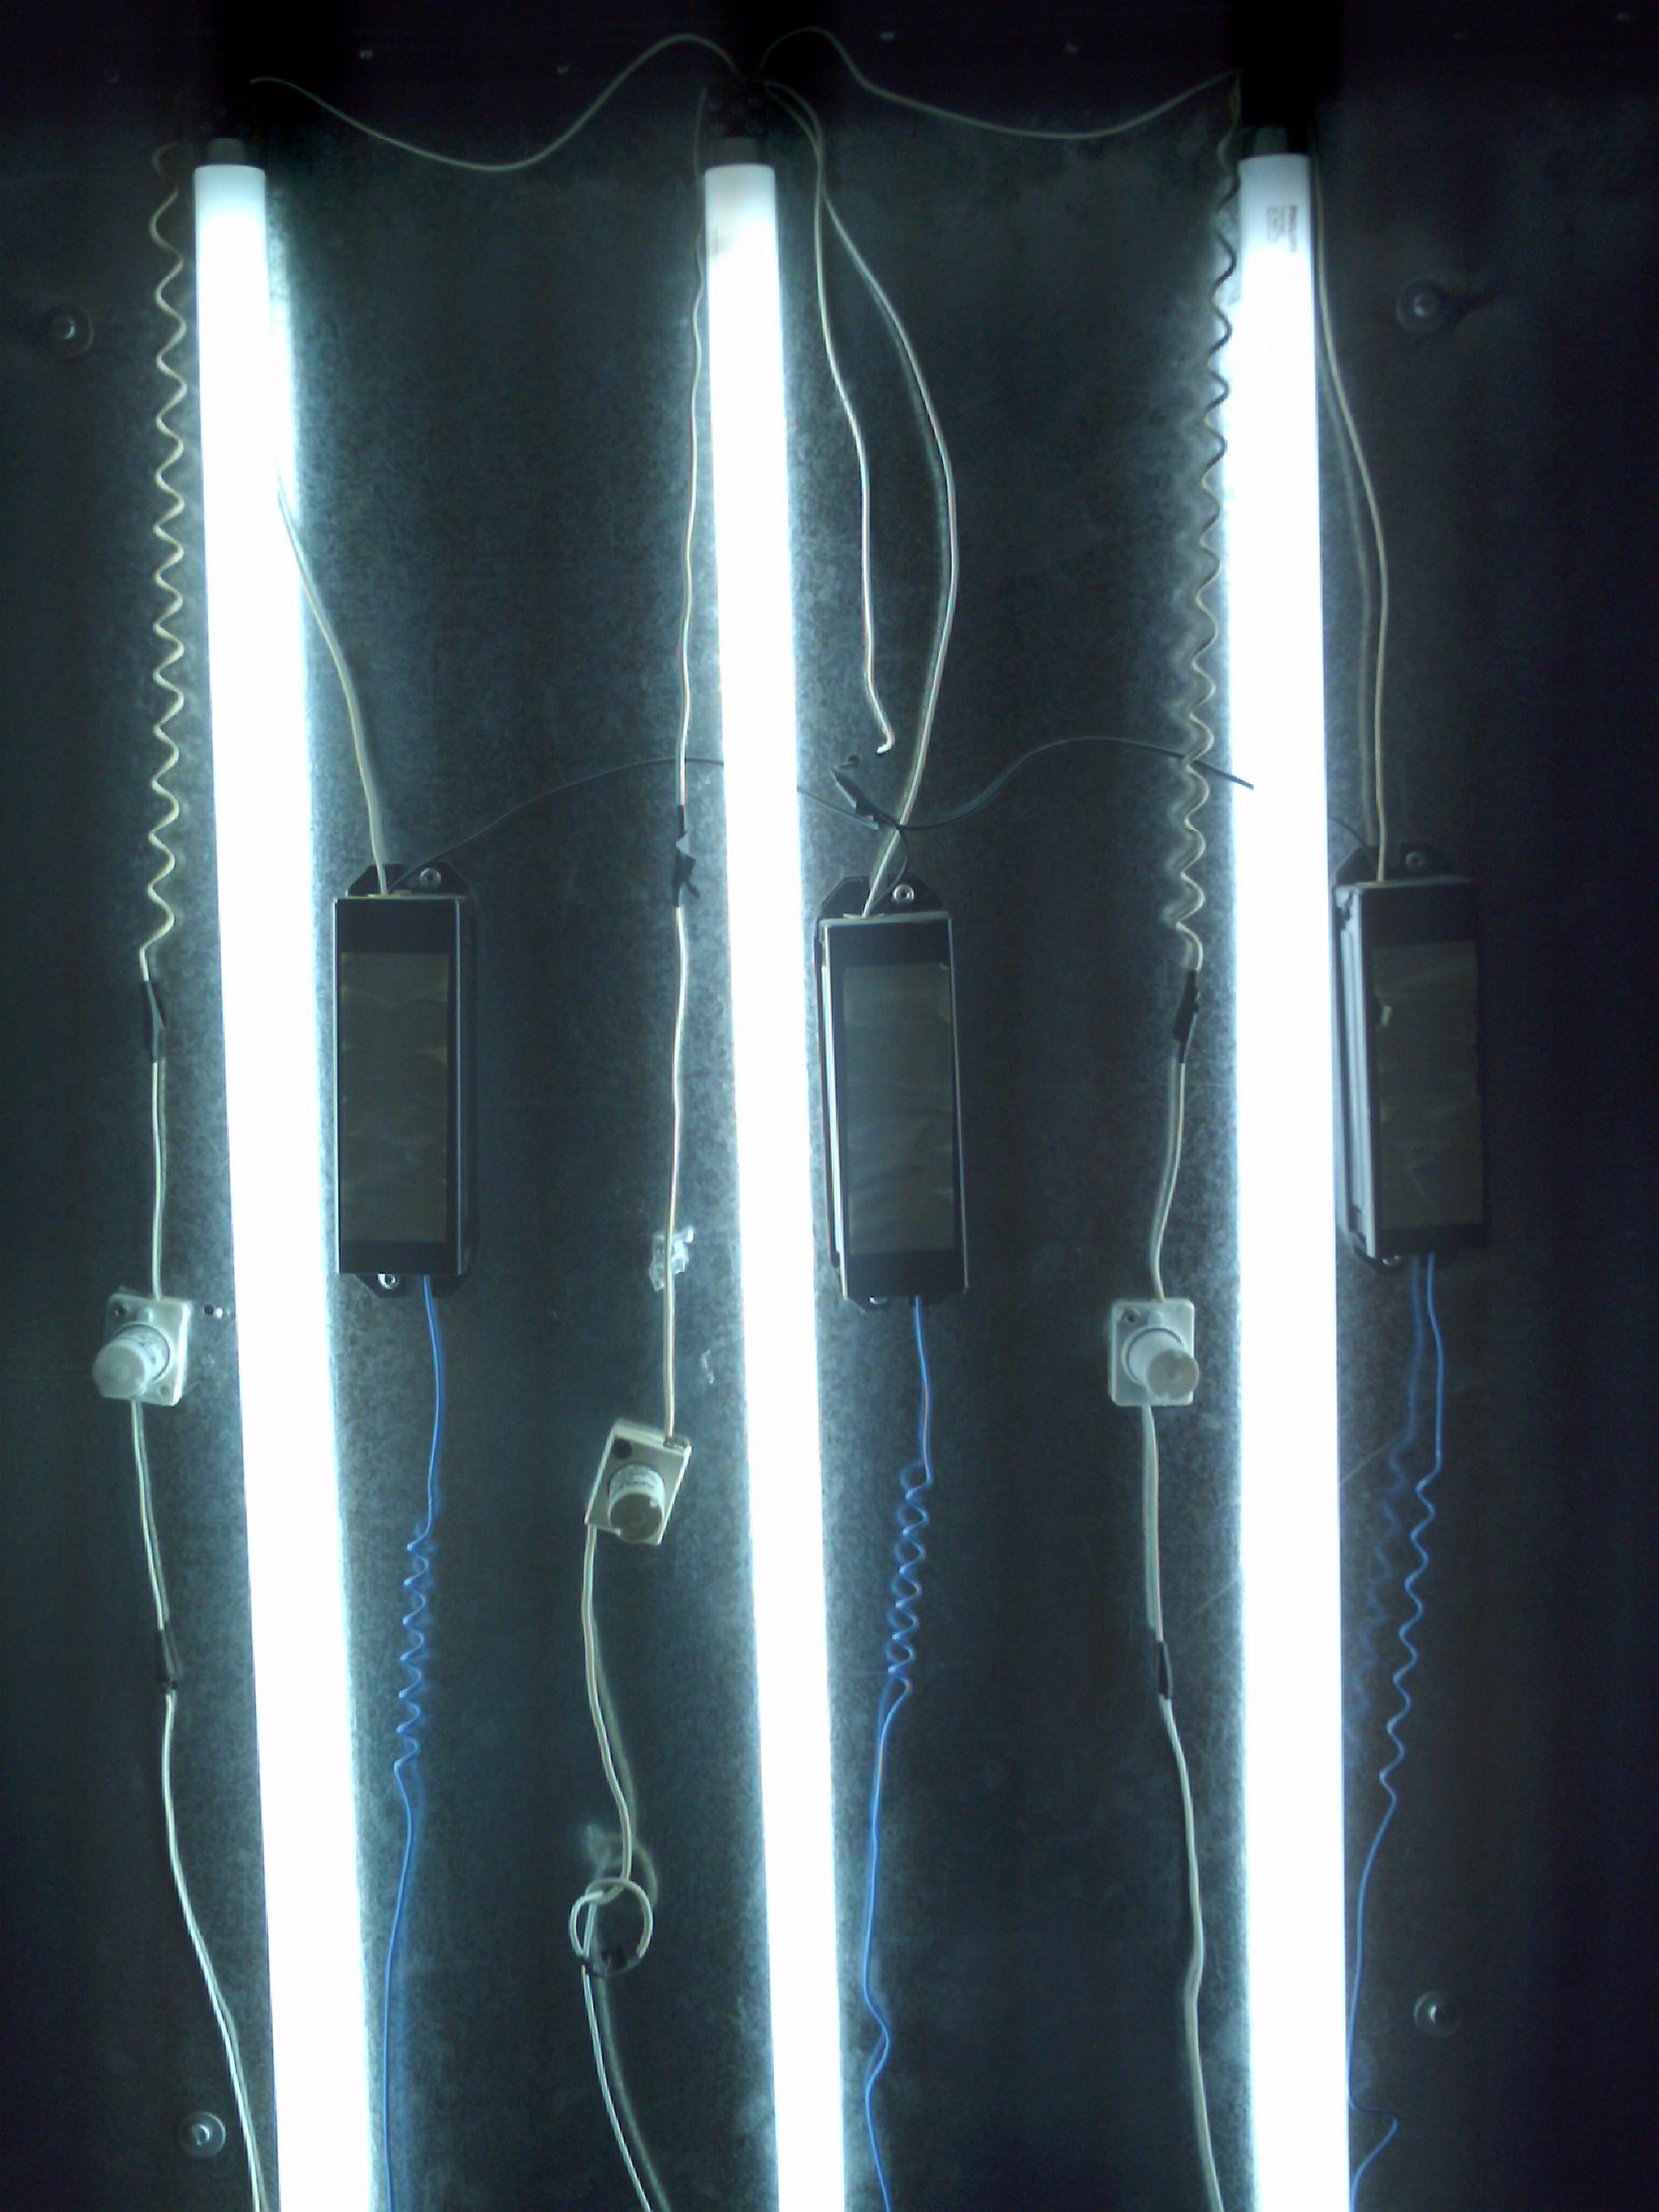 Luminarias fluorescentes